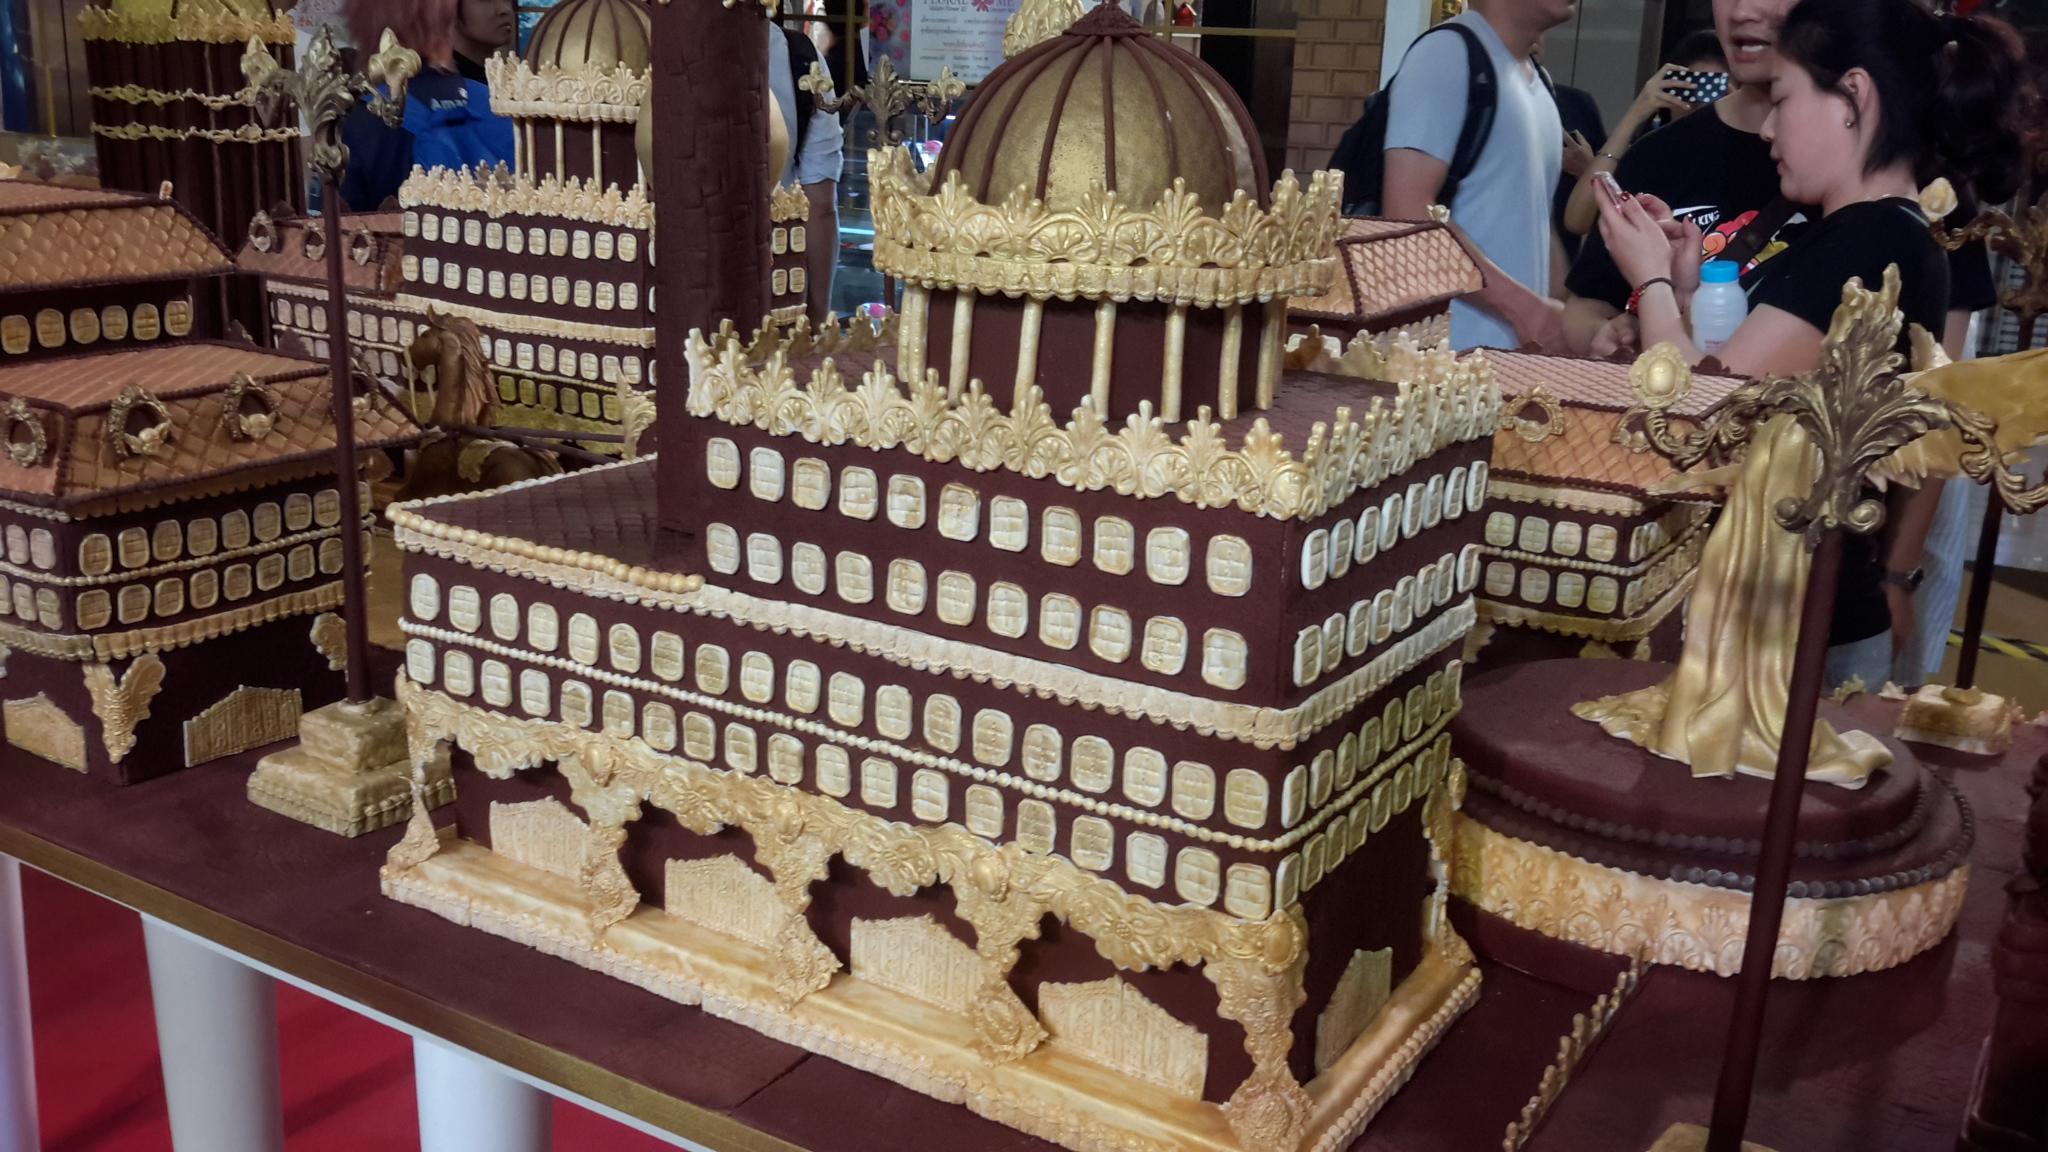 Chocolate biscuit kingdom in Wonderland of Food Art